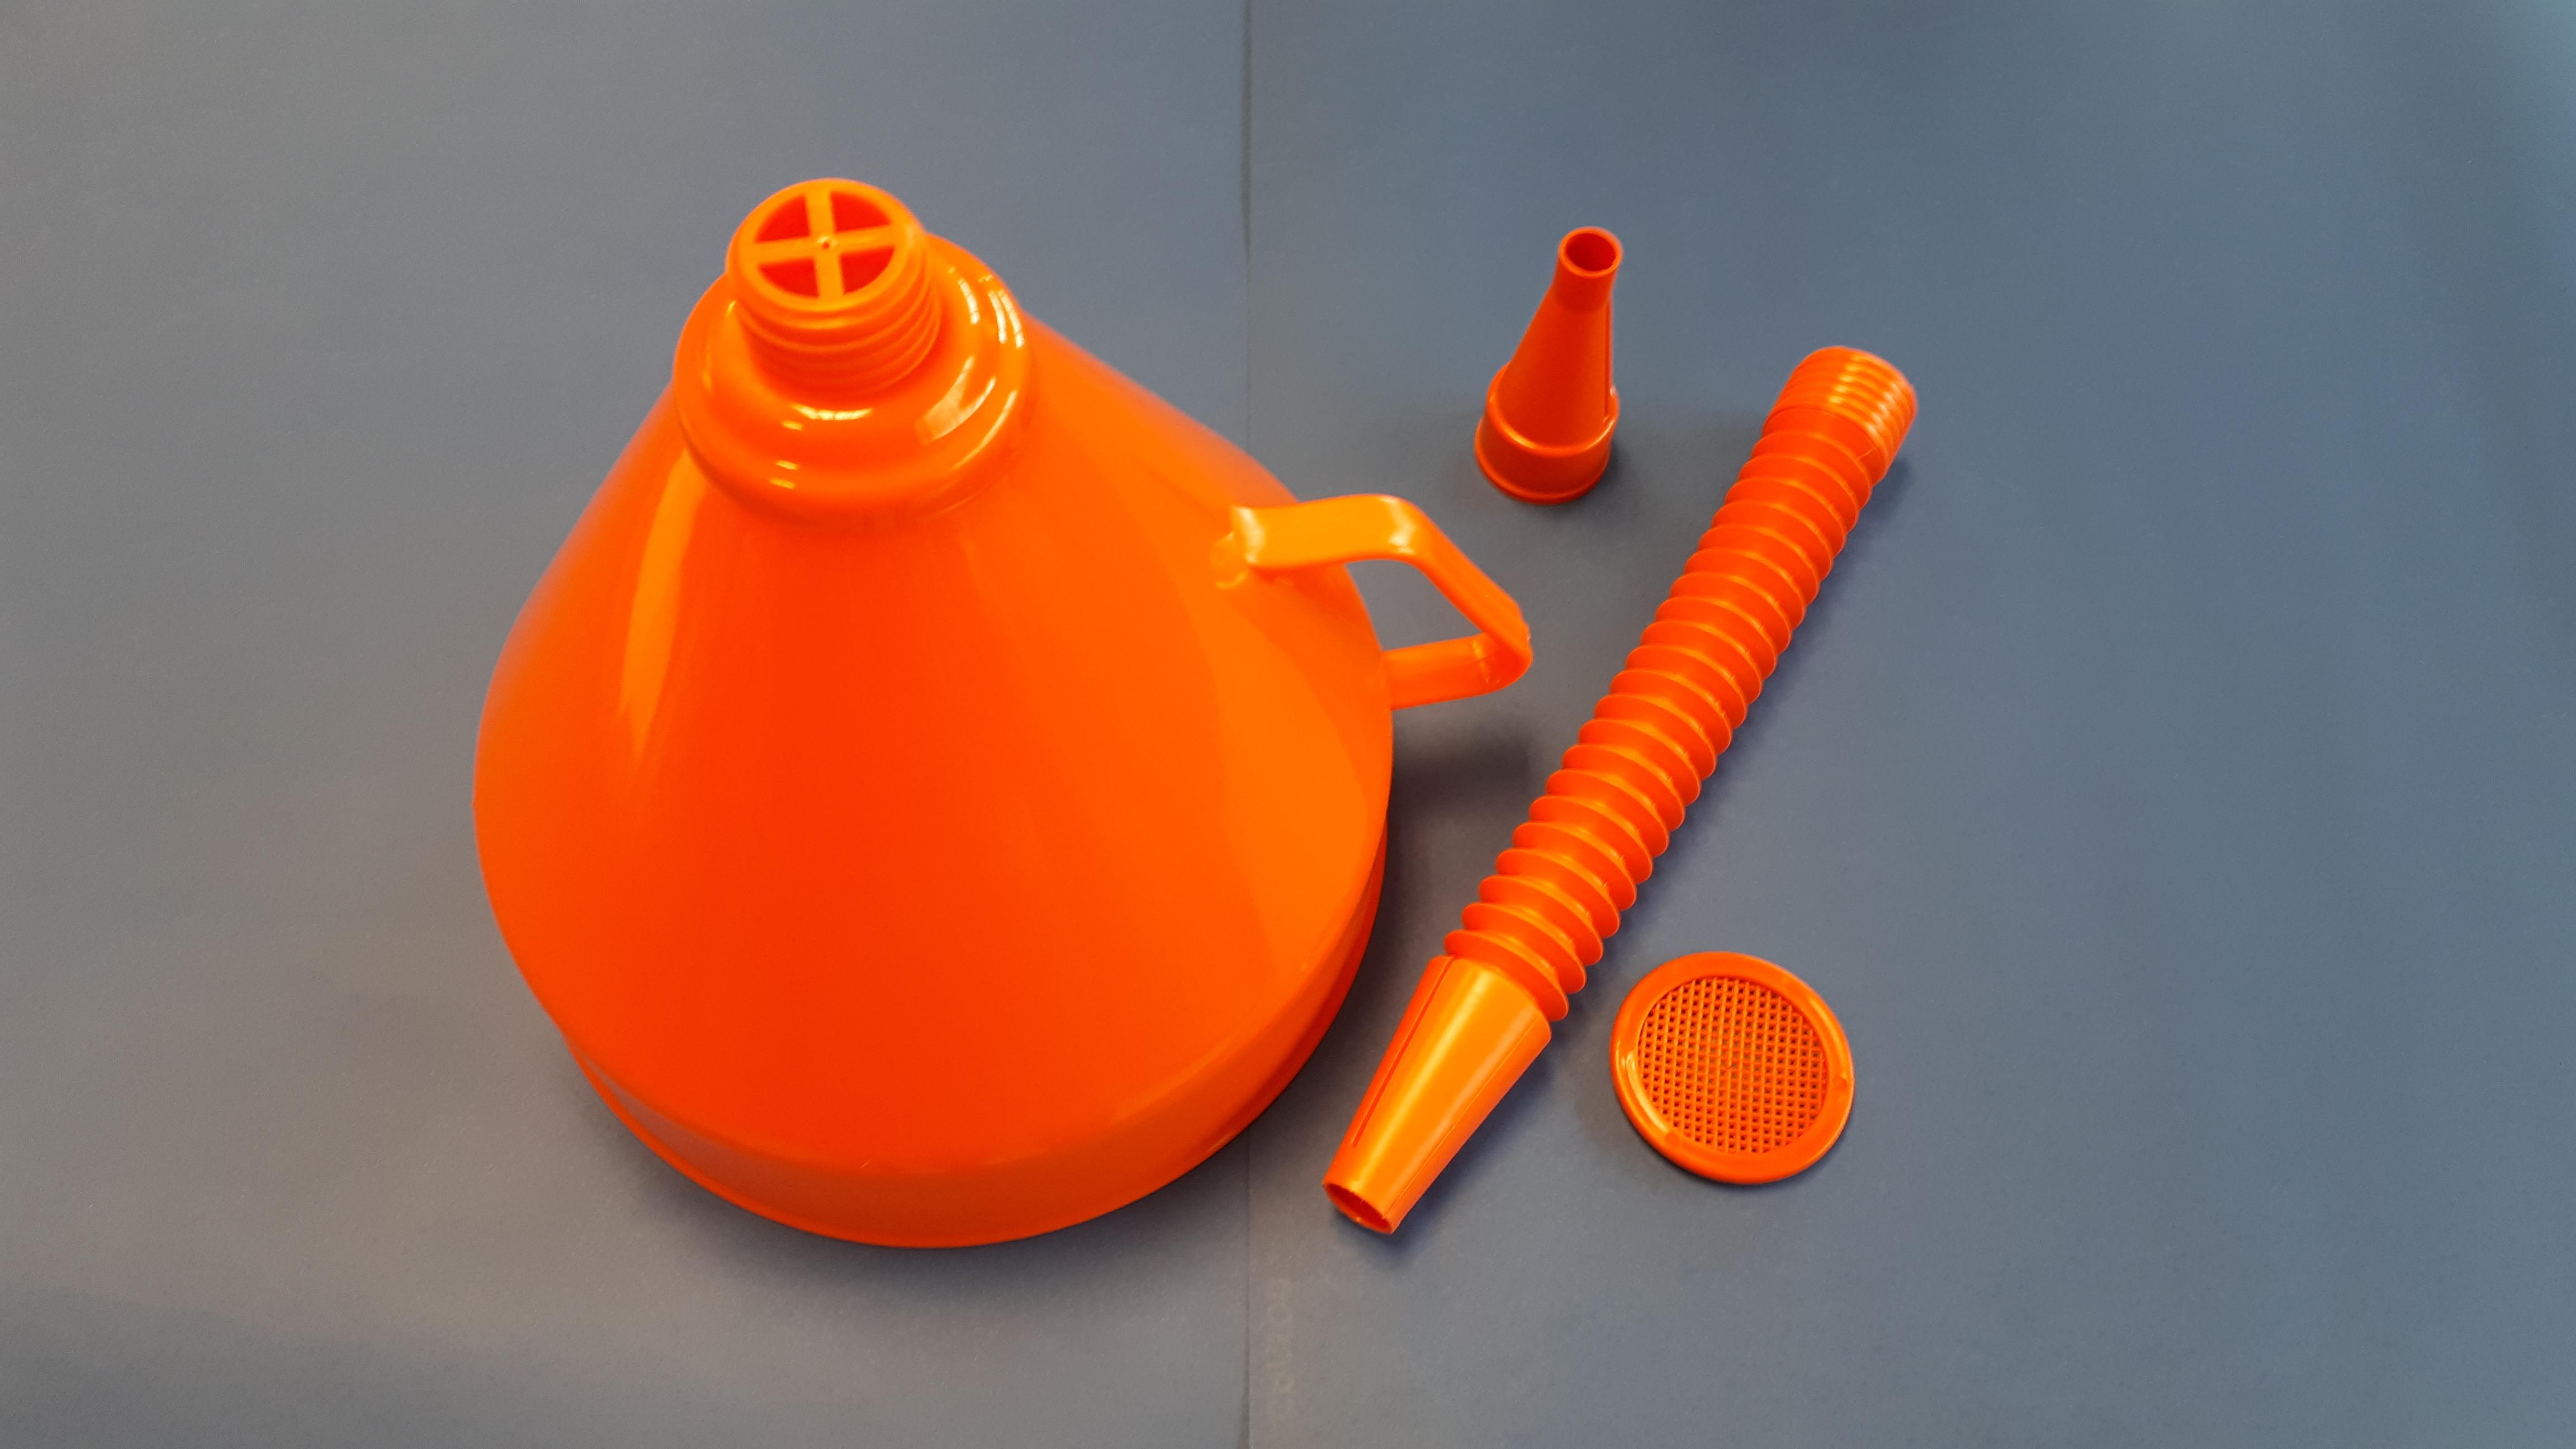 Embudo de polipropileno de Plásticos Erce